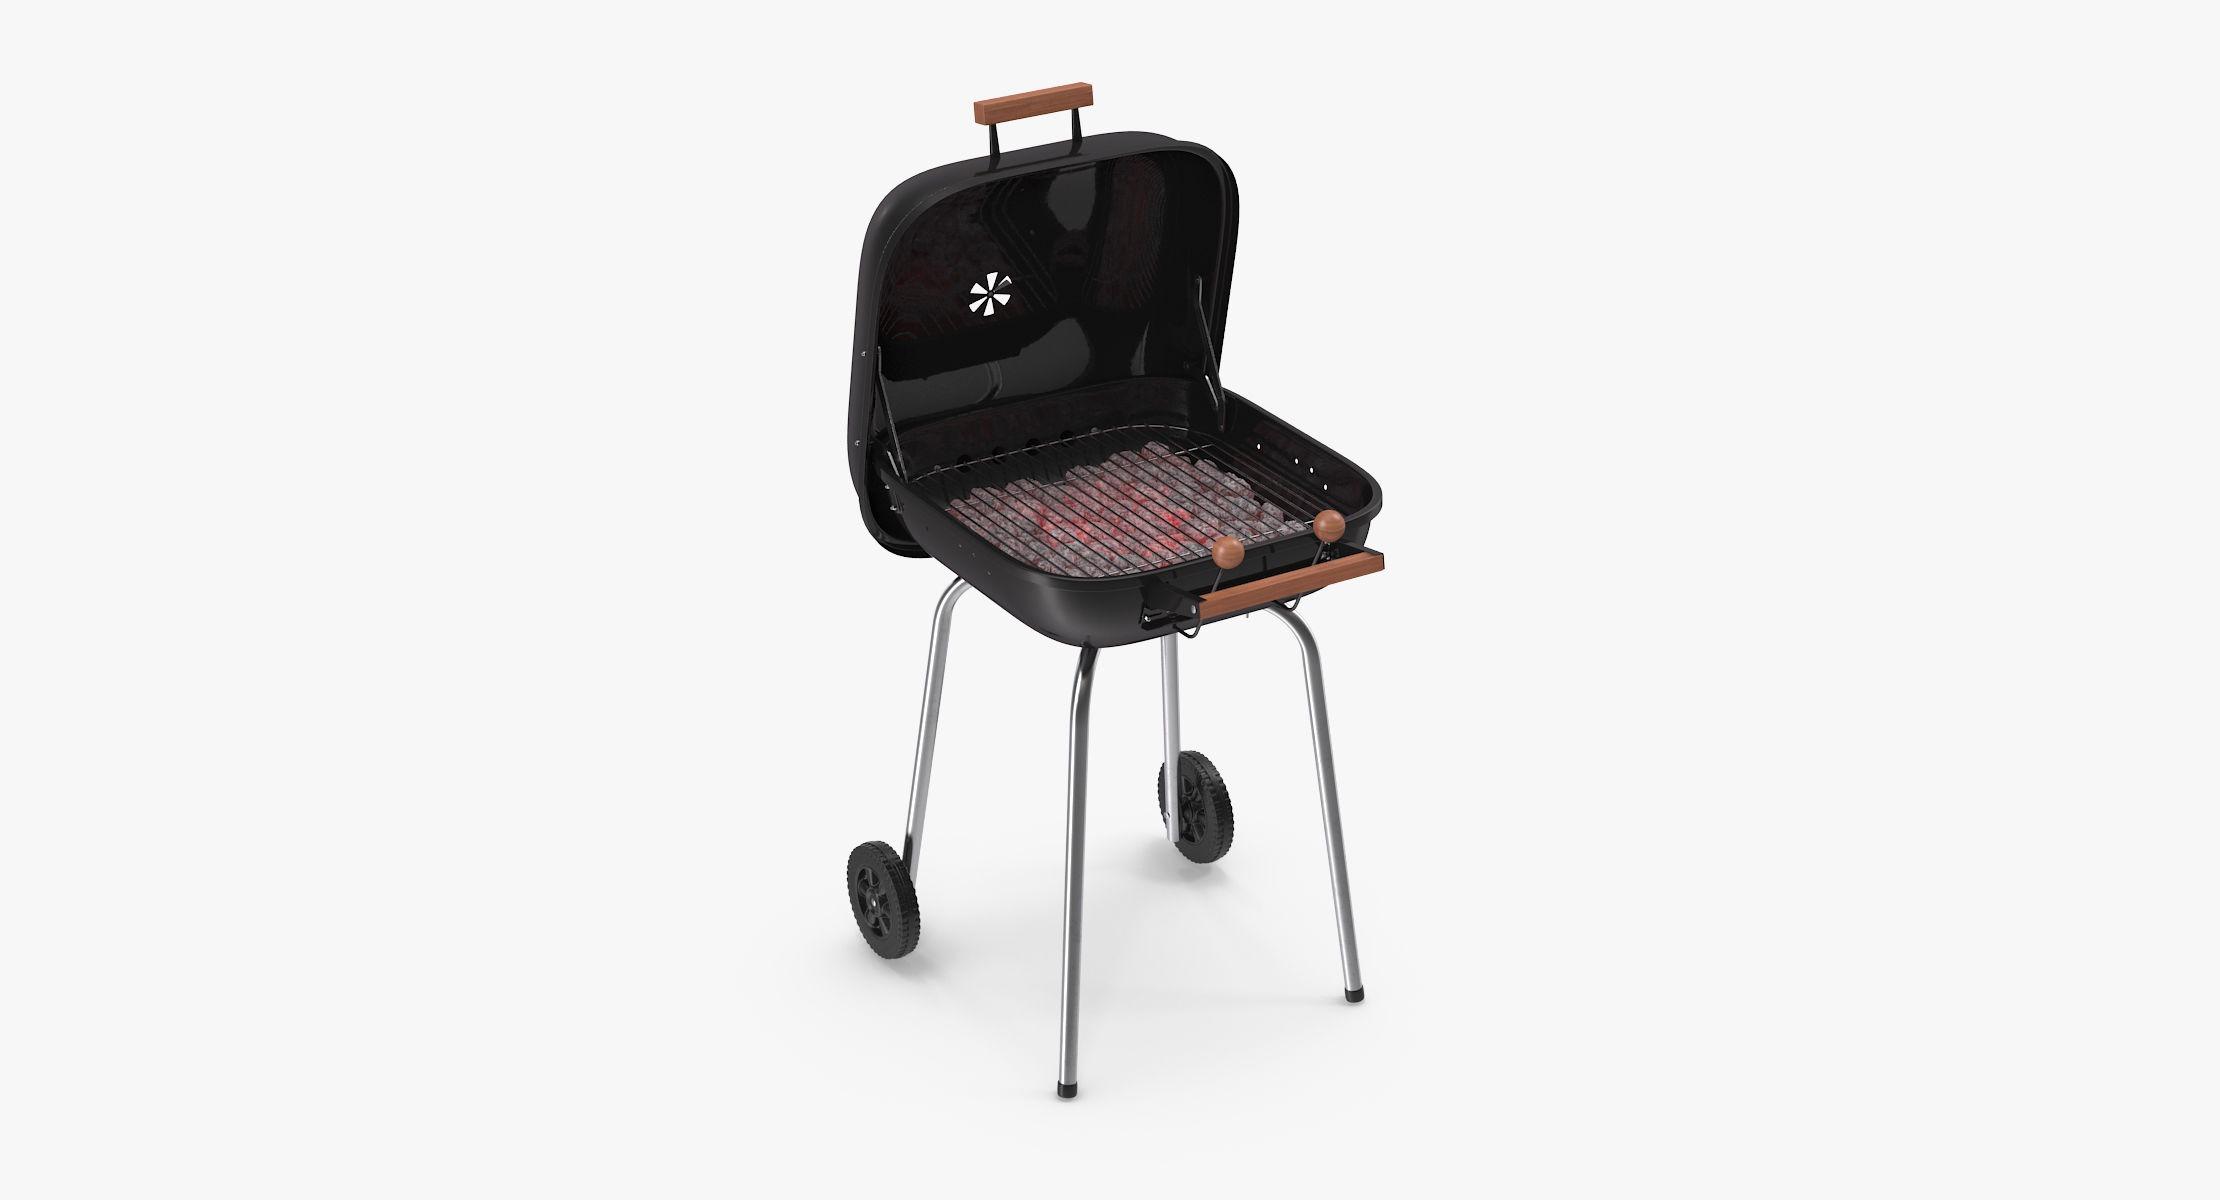 Square BBQ Grill - reel 1